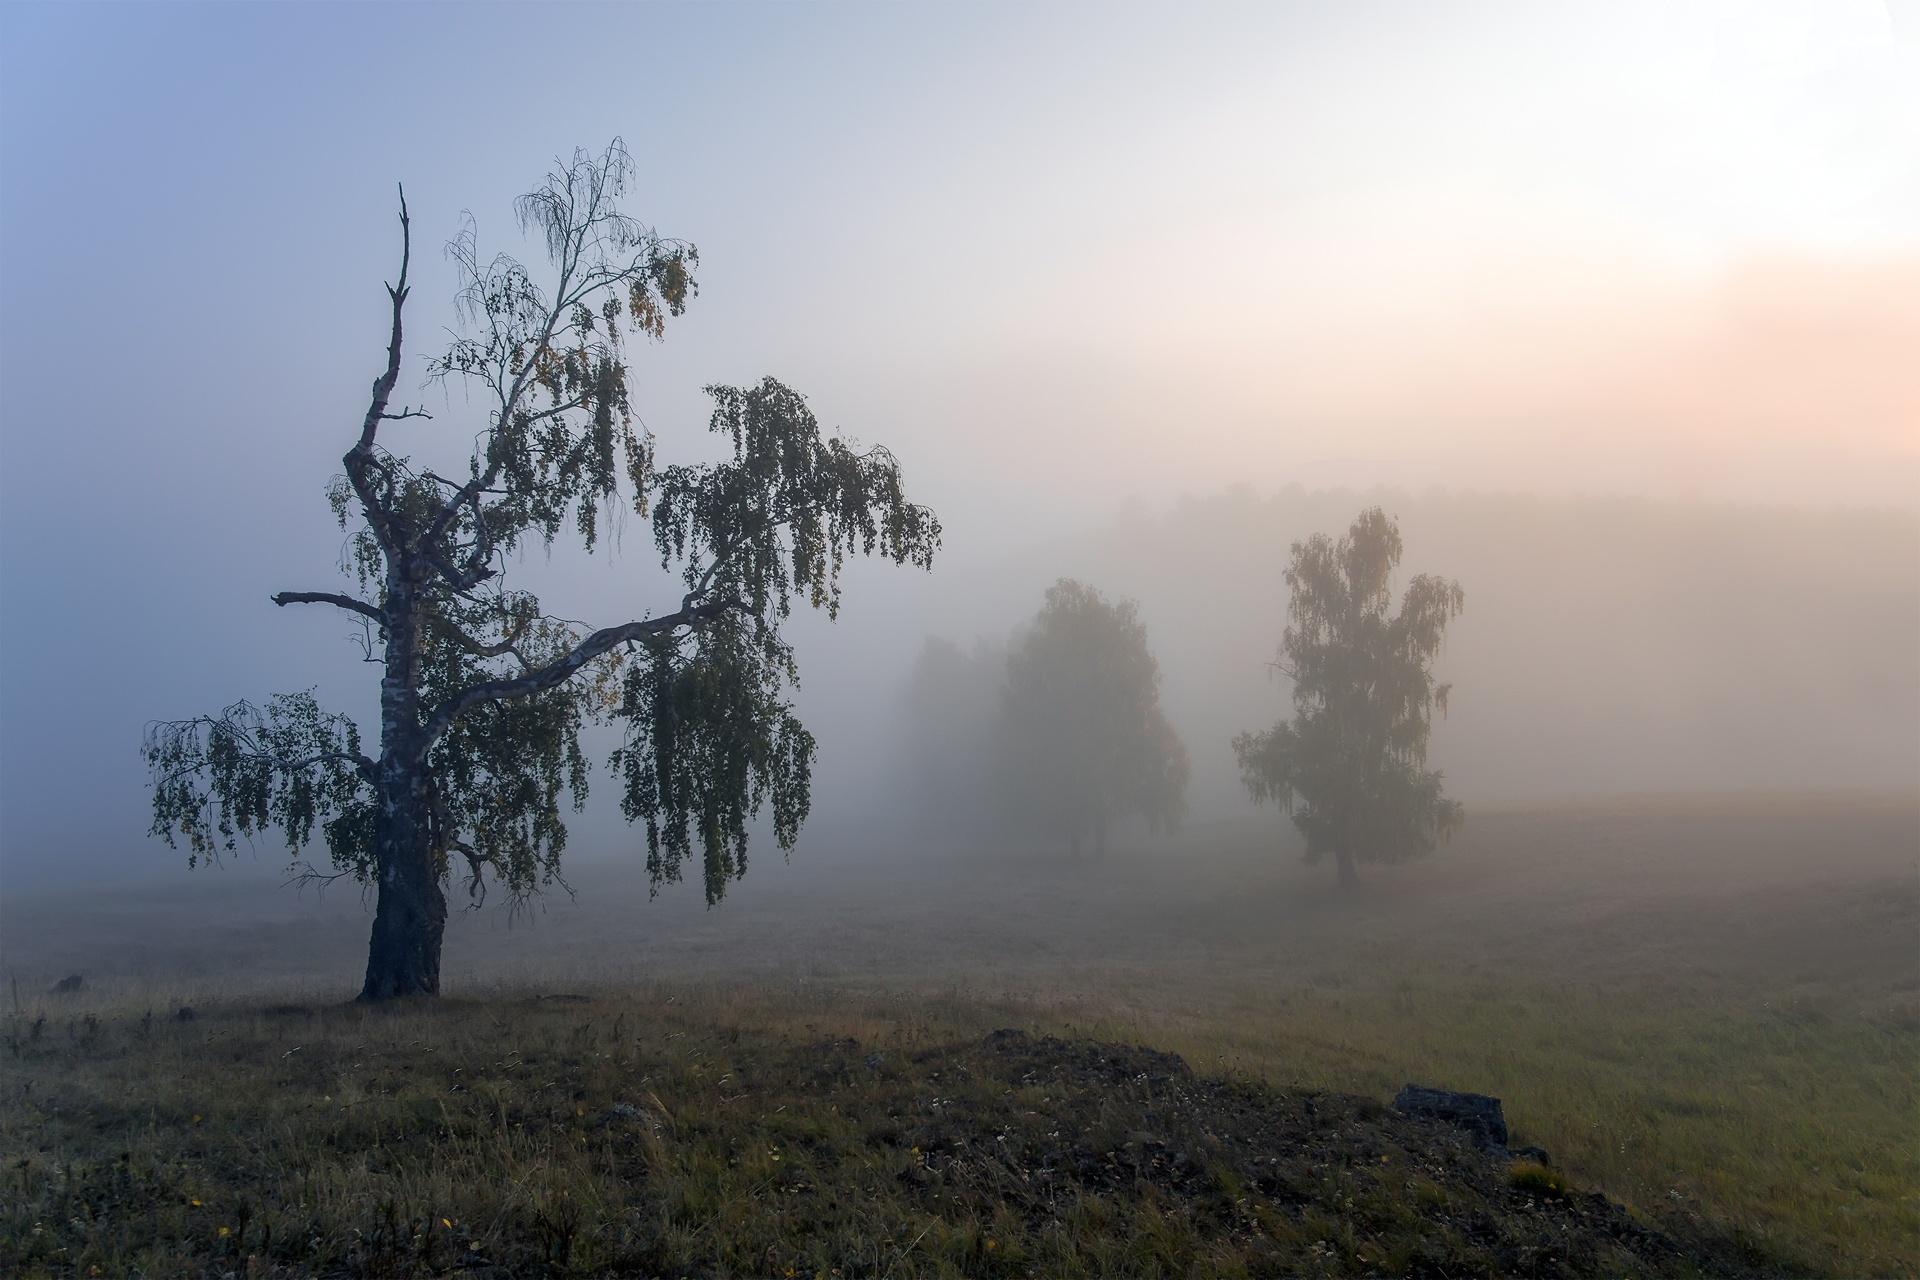 Южный Урал, раннее утро